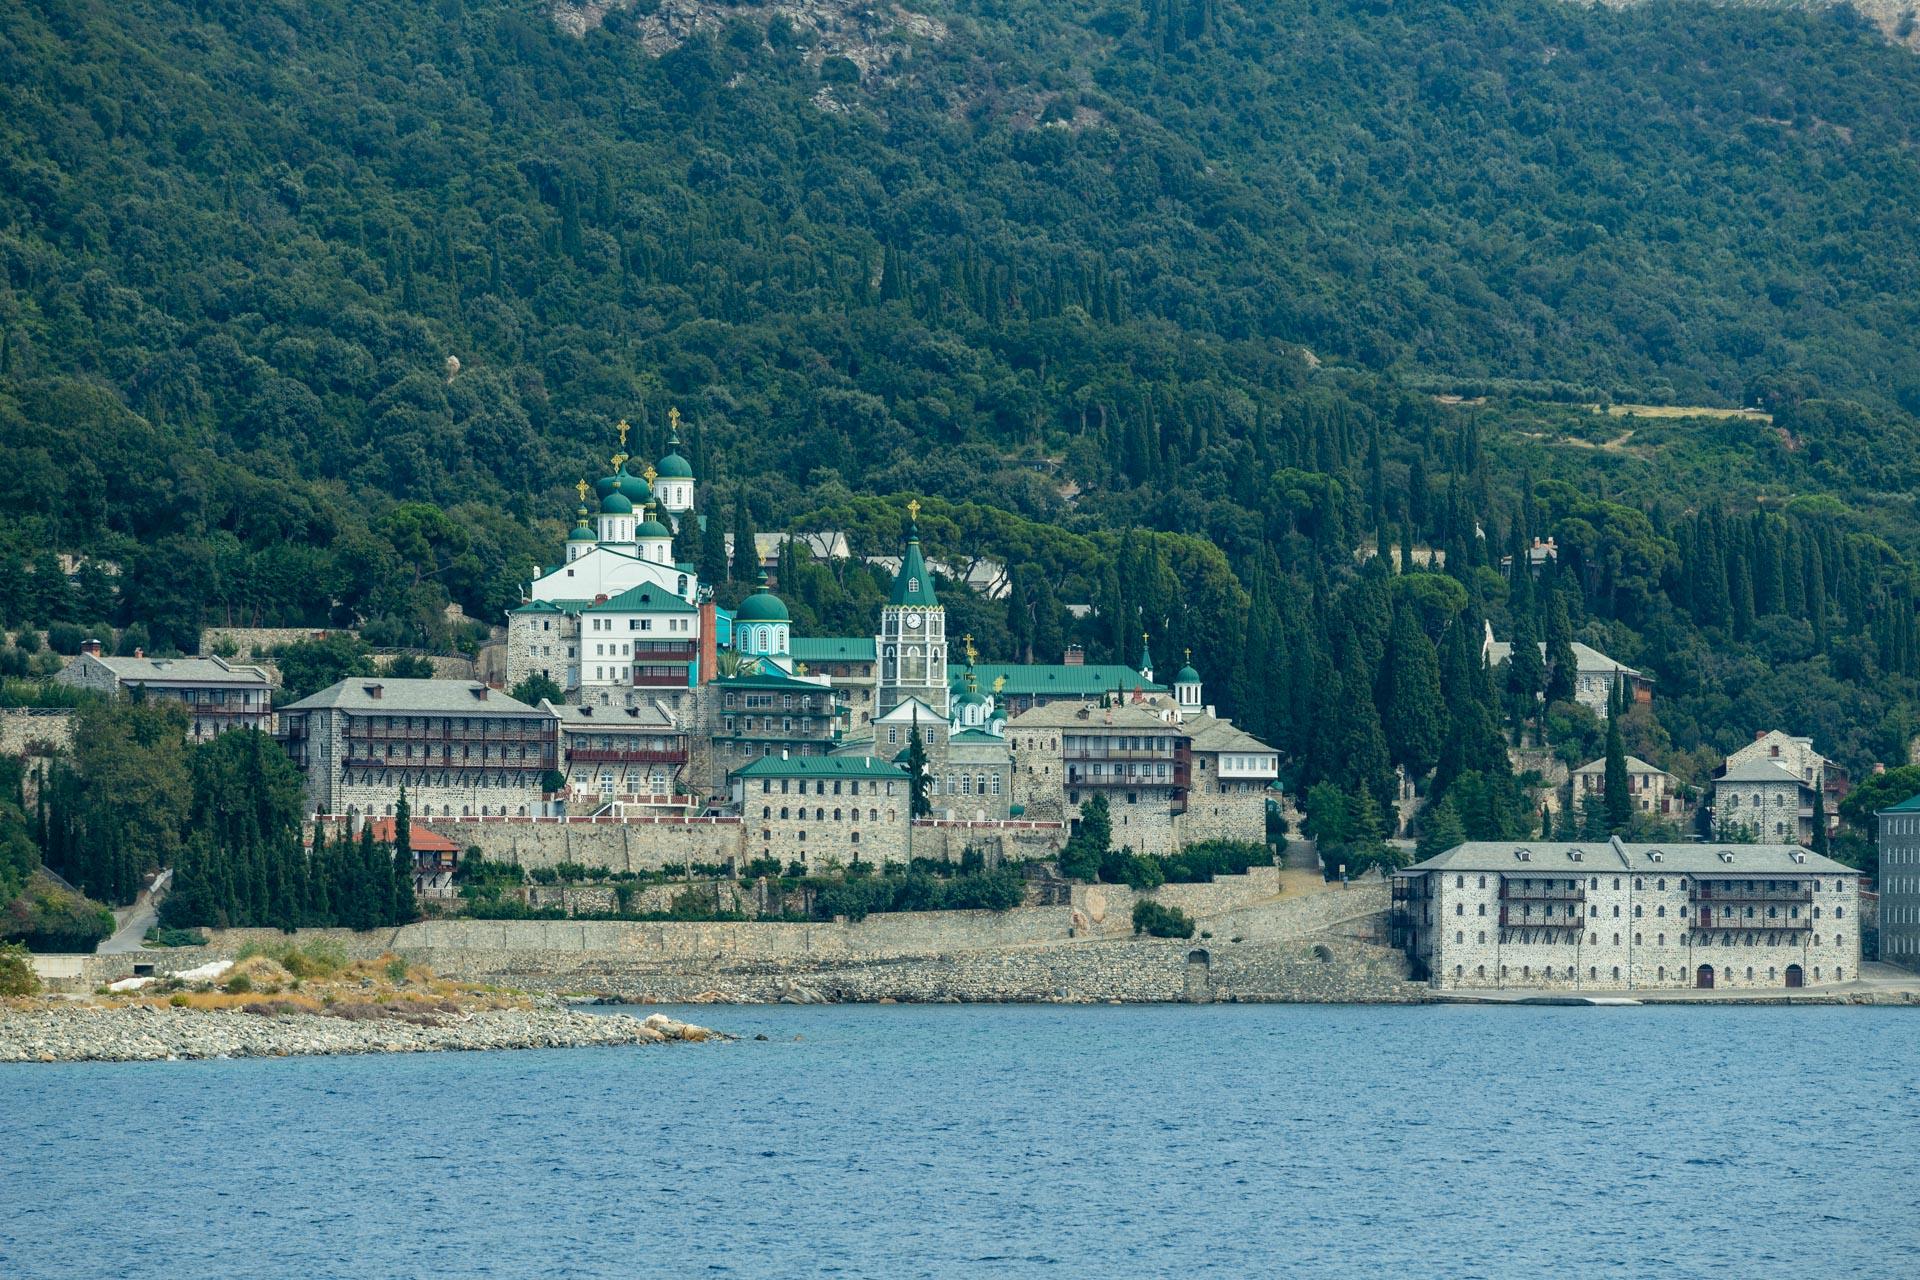 Kloster Rossikon